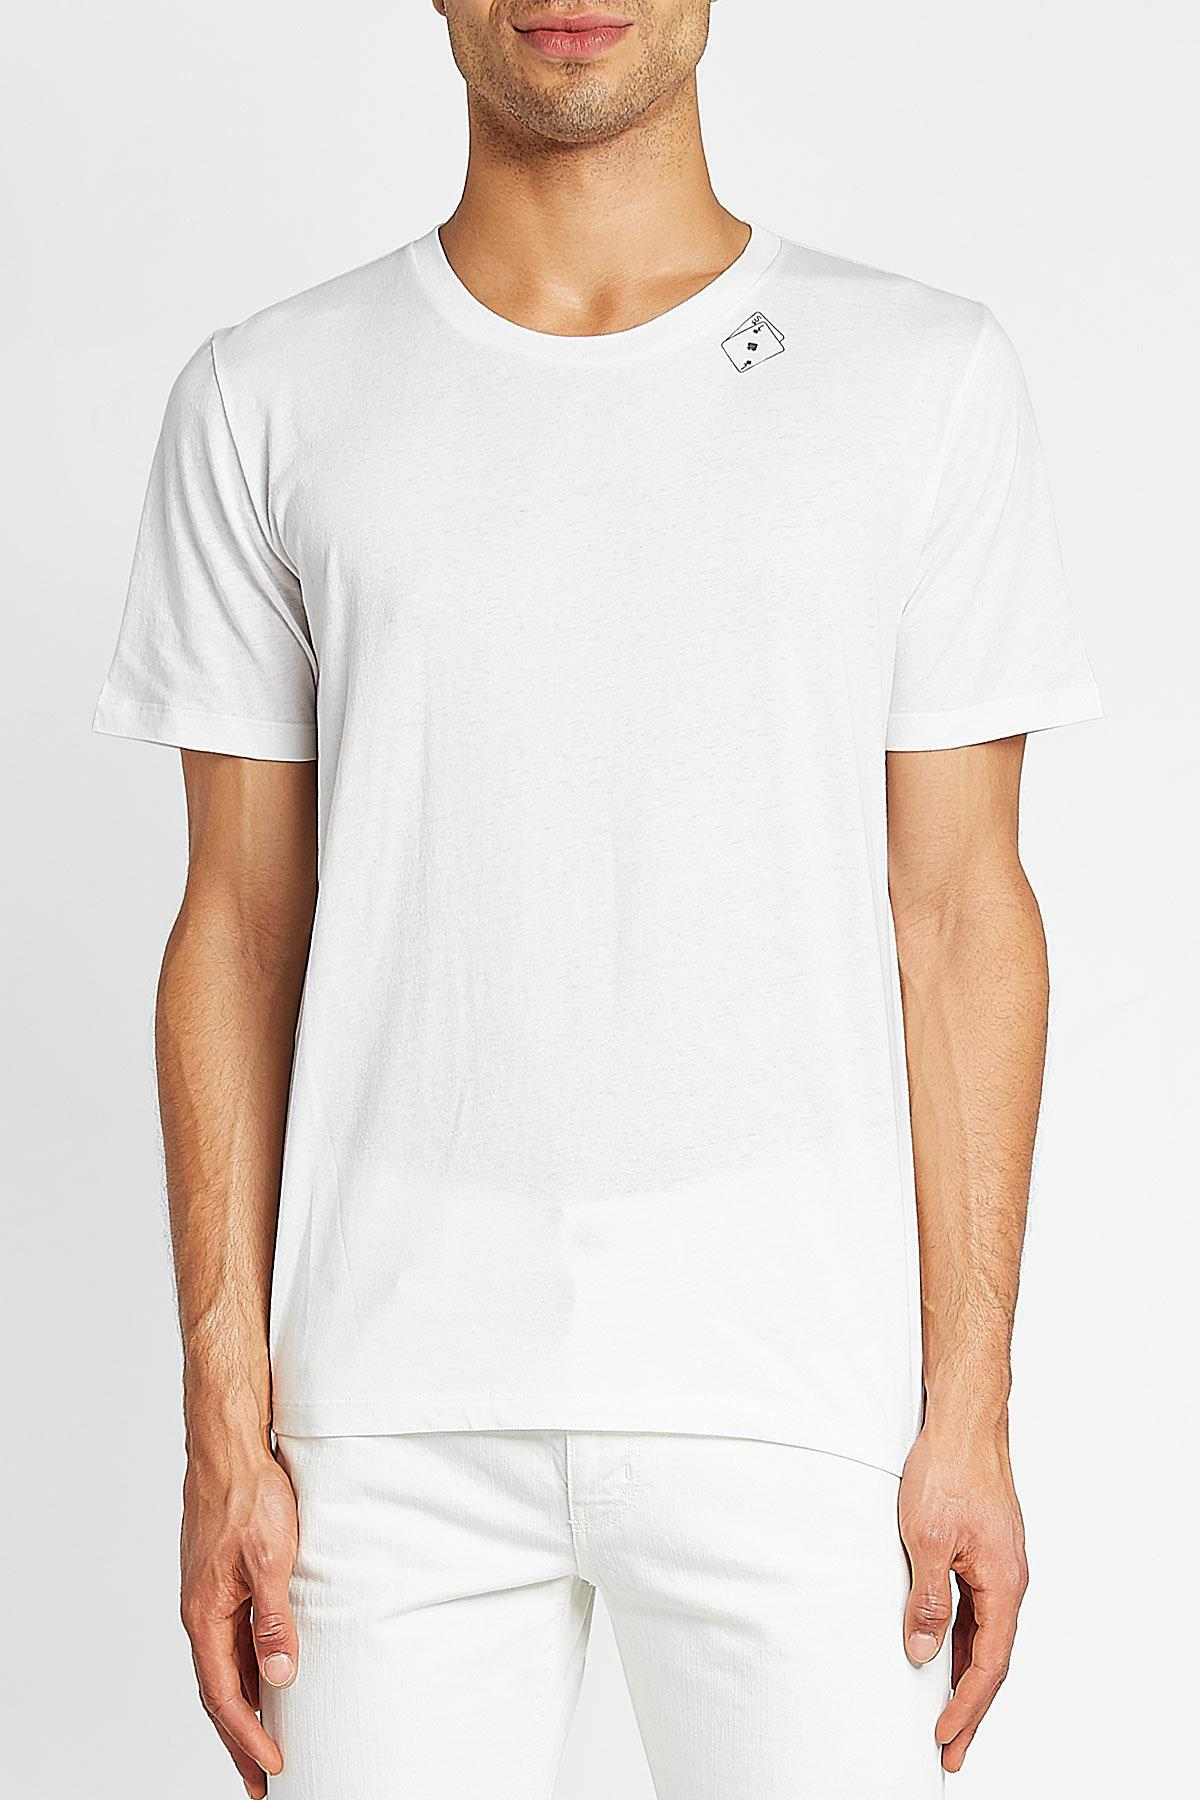 hombres Saint algodón Laurent camiseta para Card Poker Lyst Impreso White BqSARwB